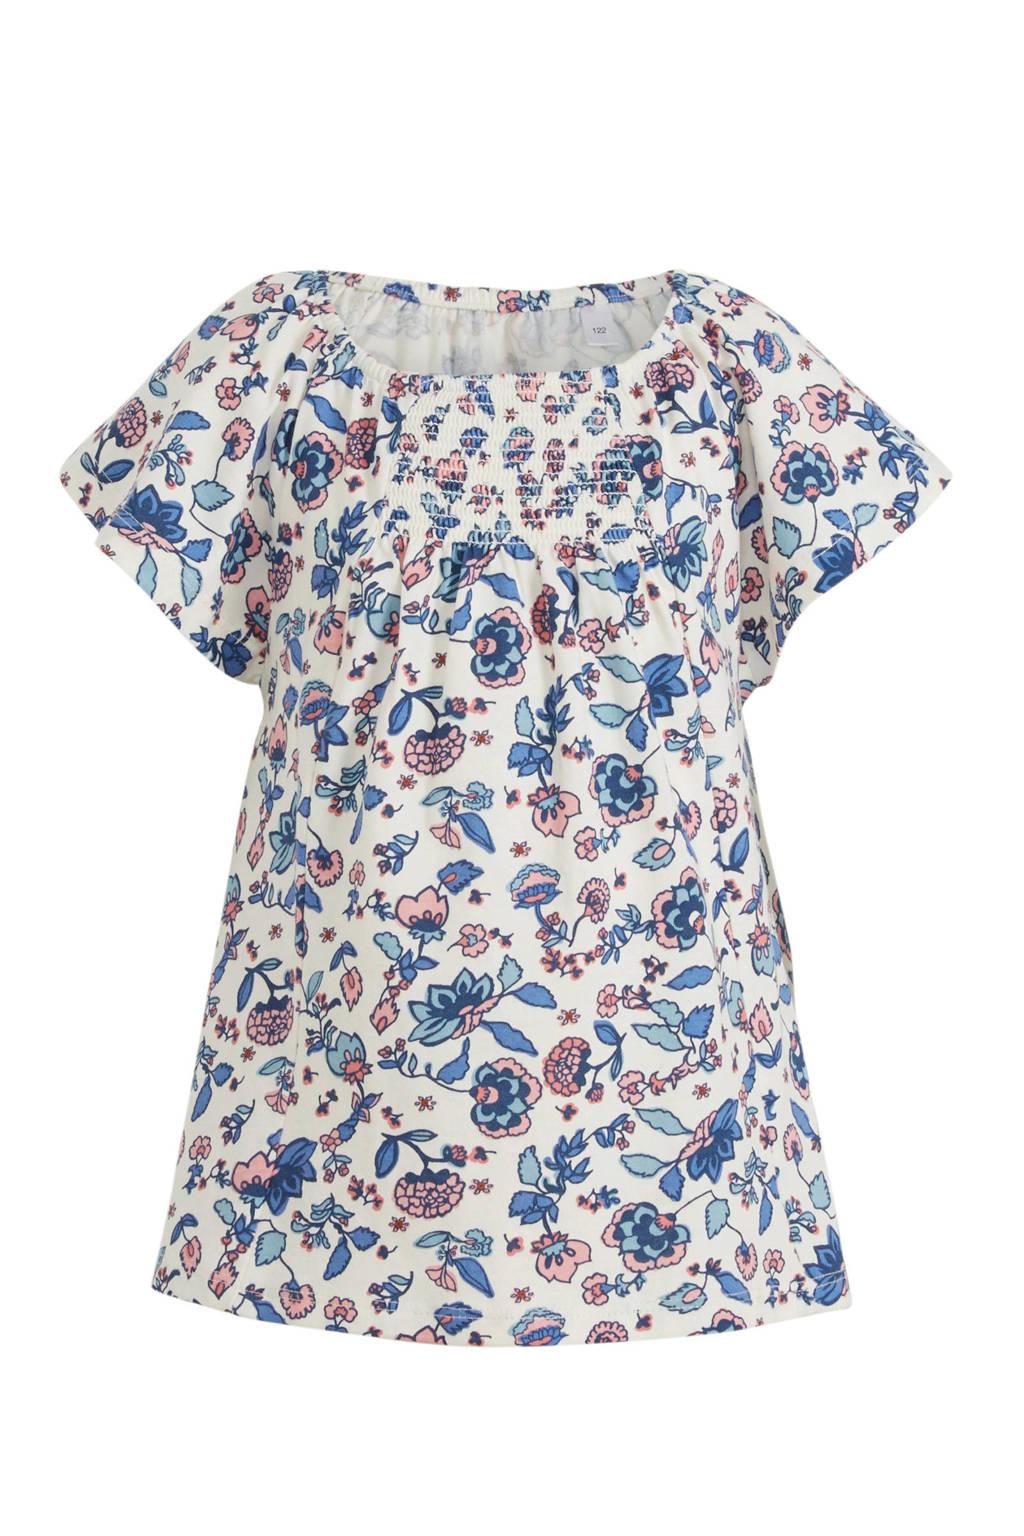 C&A Palomino gebloemd T-shirt wit/lichtroze/blauw, Wit/lichtroze/blauw